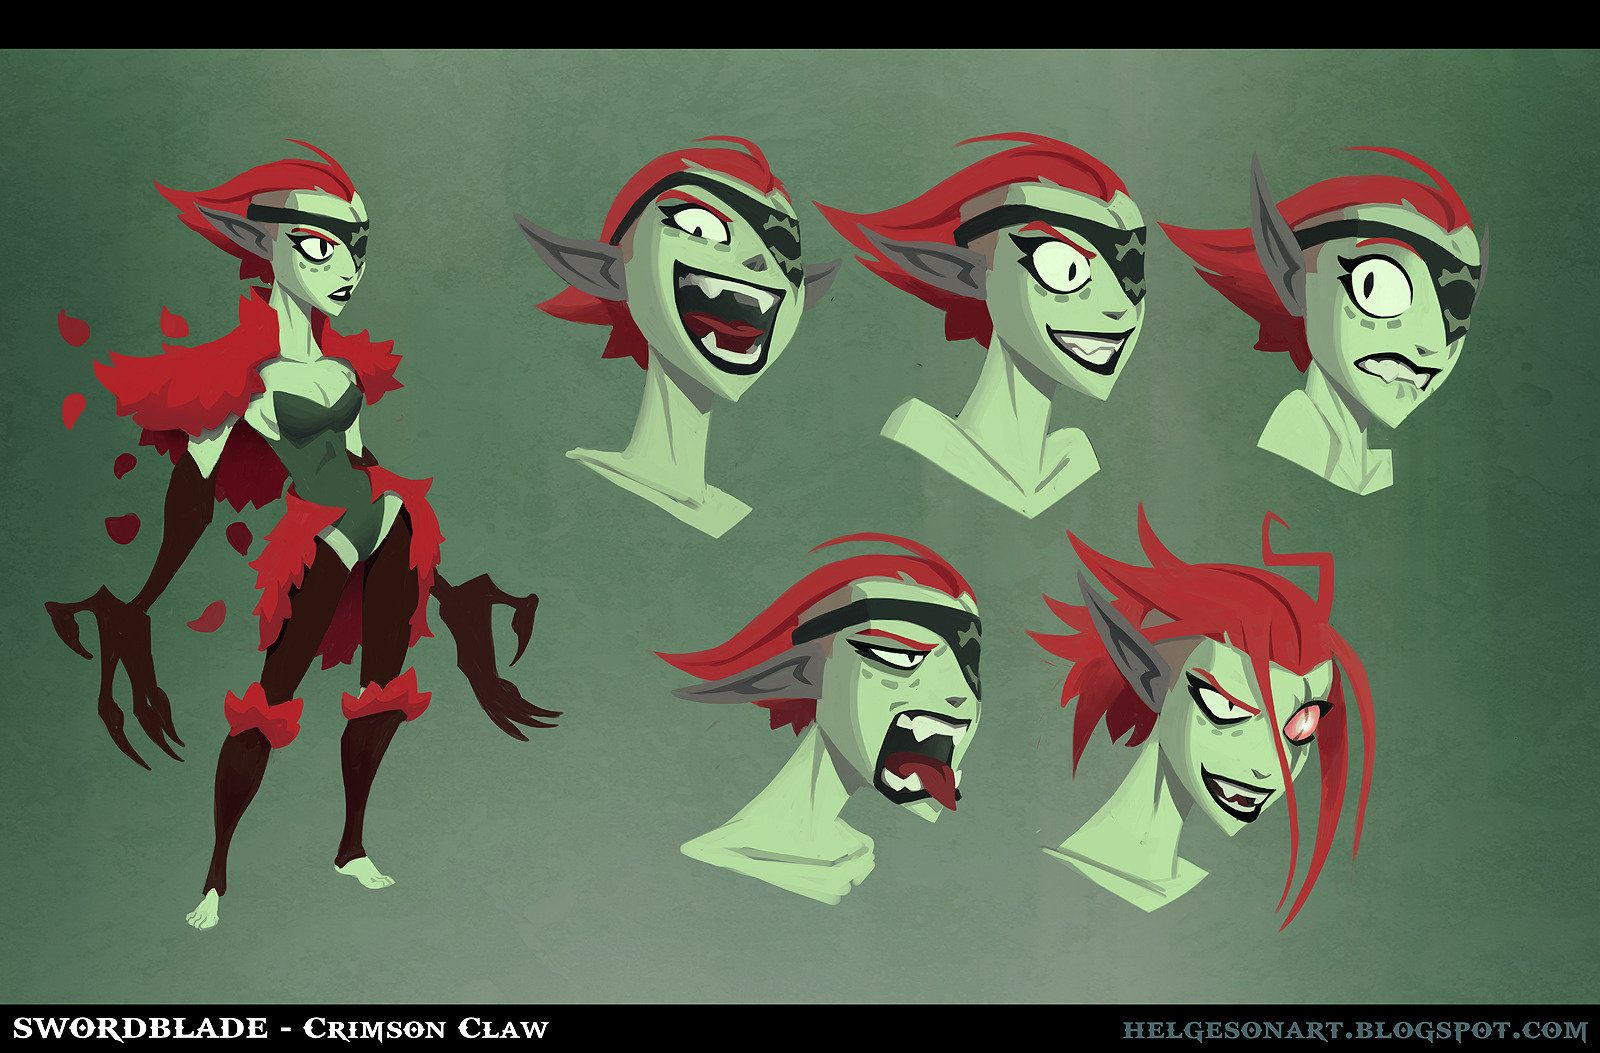 Swordblade - Crimson Claw, Johannes Helgeson on ArtStation at http://www.artstation.com/artwork/swordblade-crimson-claw